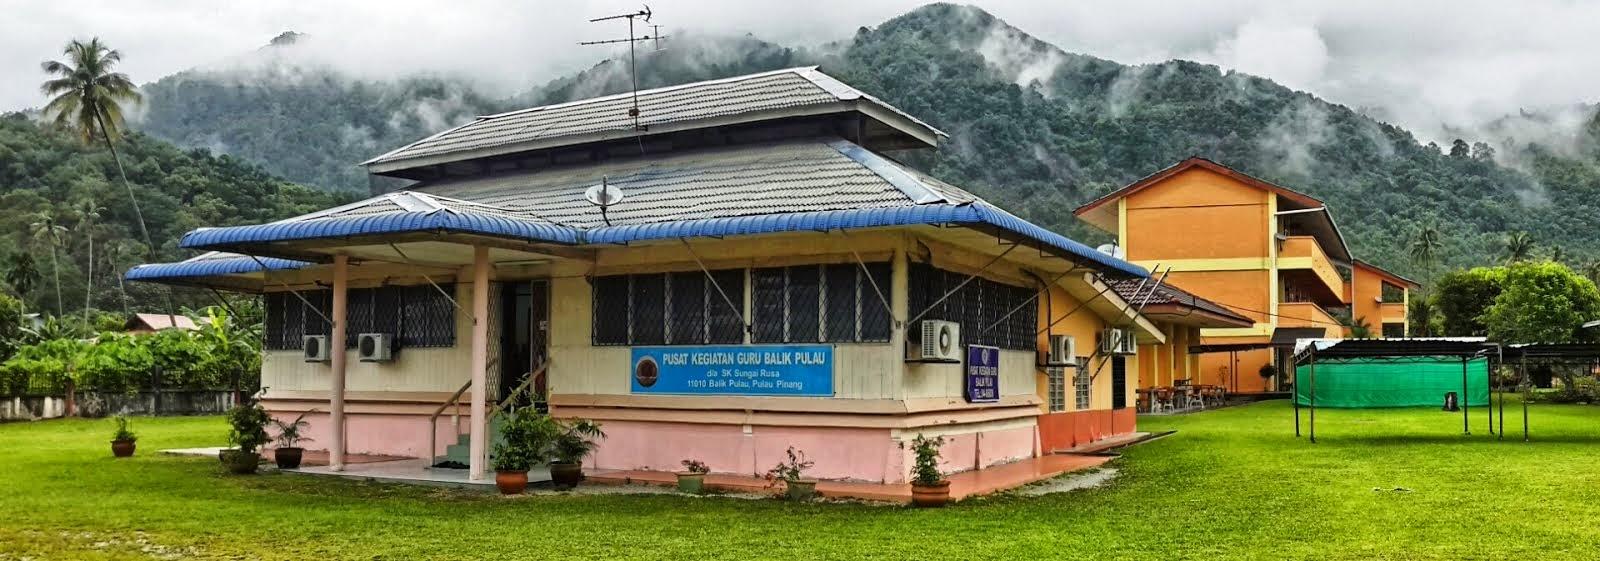 Pusat Kegiatan Guru Balik Pulau